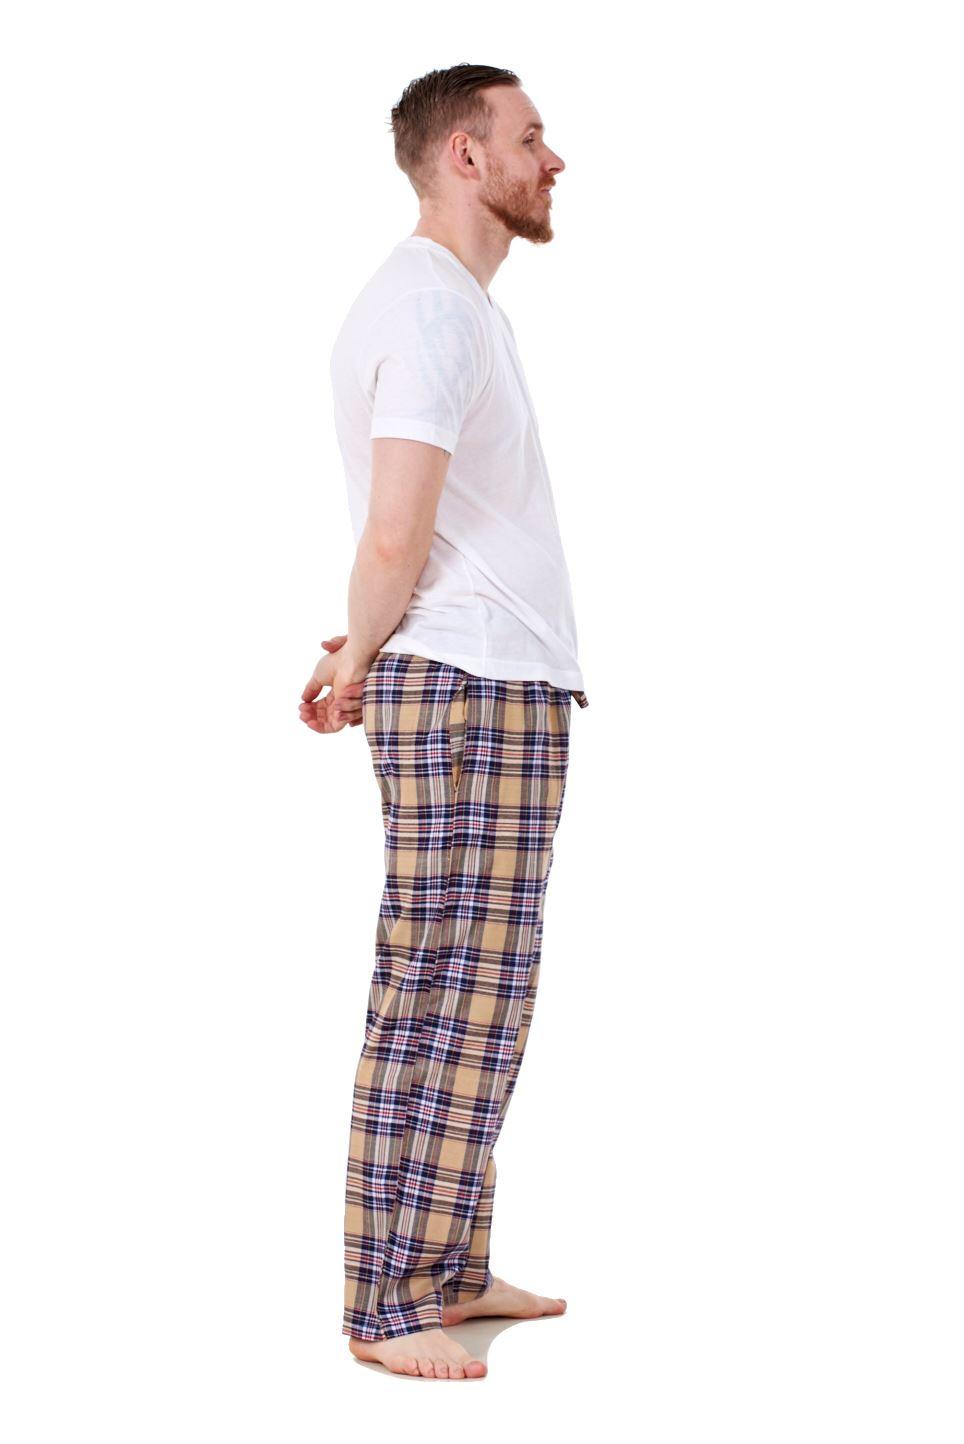 Mens-Pyjama-Bottoms-Rich-Cotton-Woven-Check-Lounge-Pant-Nightwear-Big-3XL-to-5XL Indexbild 29